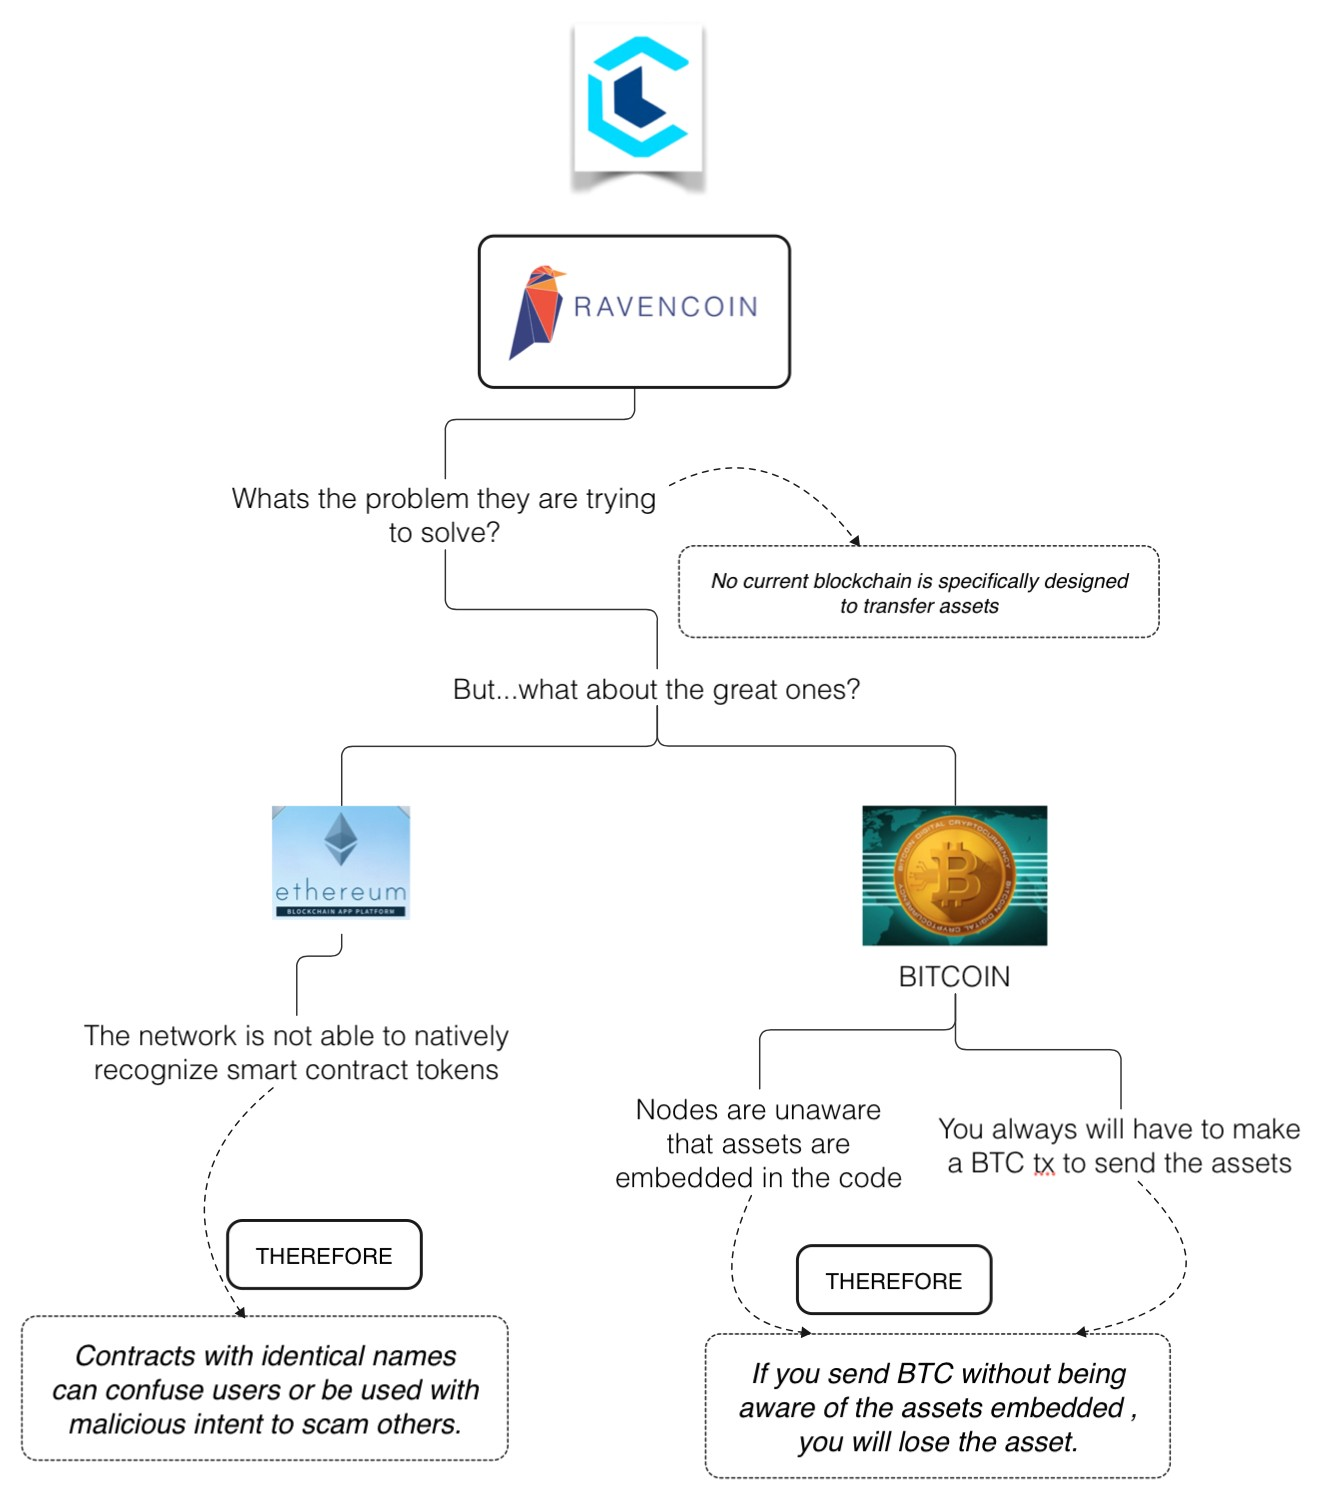 Ravencoin Review — A Bitcoin Code Fork Looking to Bring Real-World